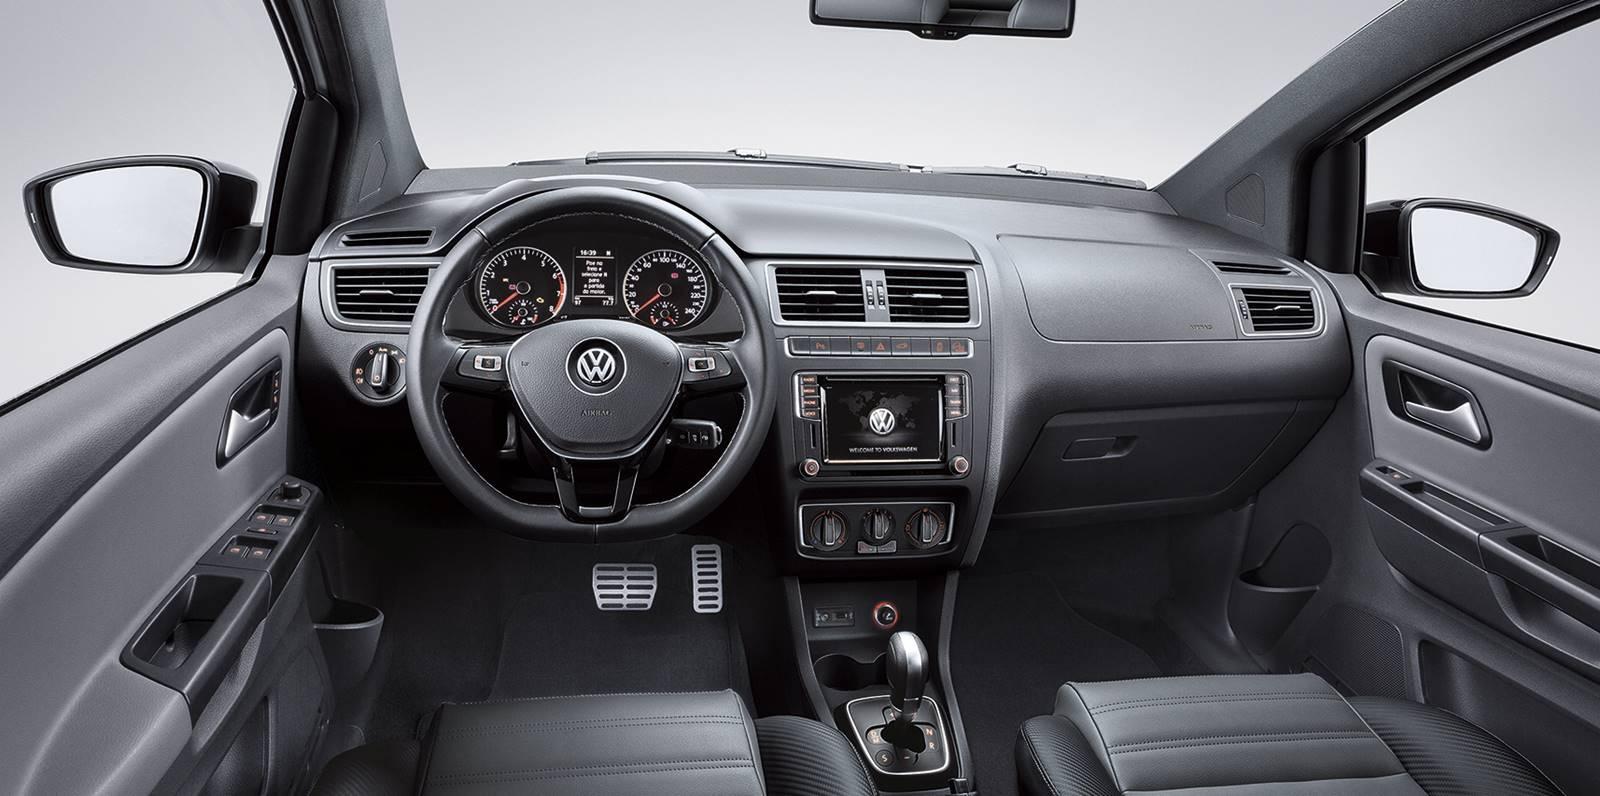 Volkswagen Crossfox 2017 Urban White Fotos E Detalhes